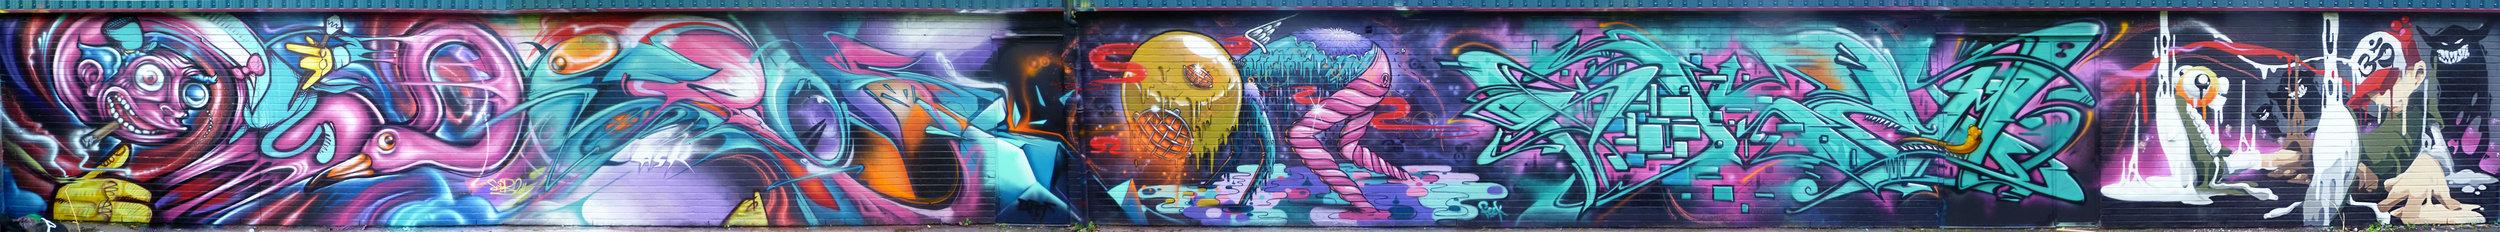 Bristol '11. With Epok & 3Dom, Soker, Cheo